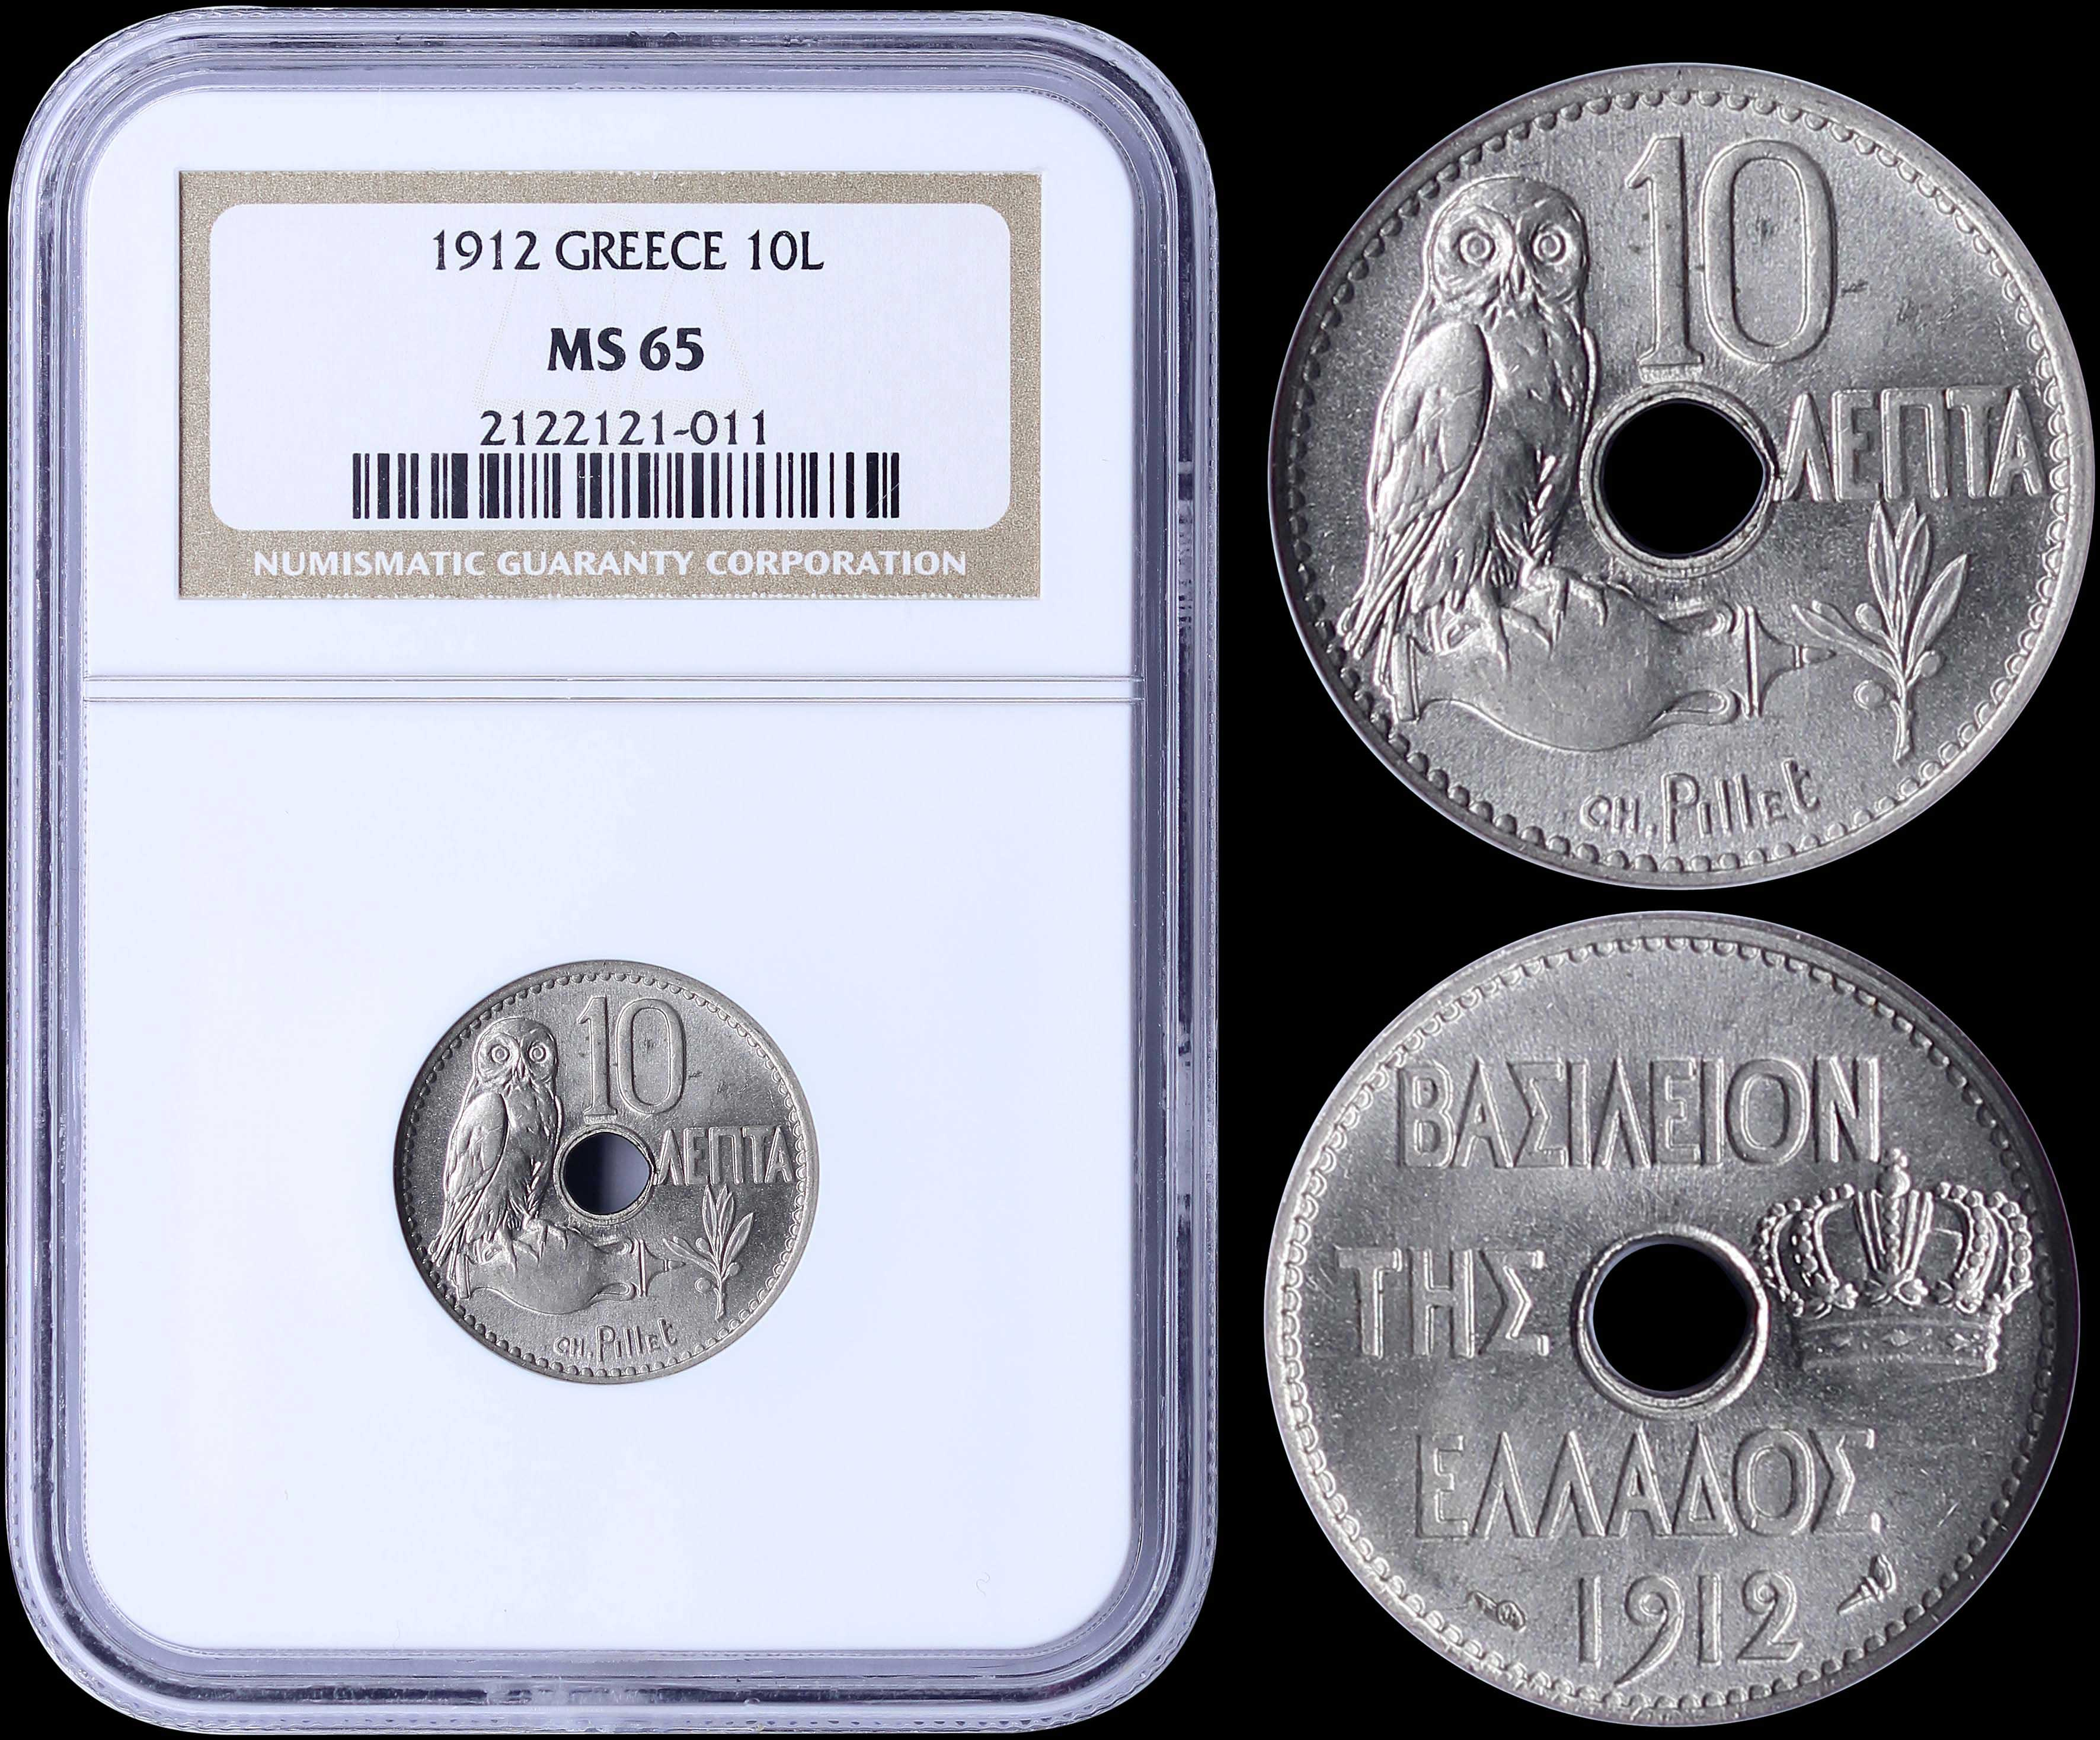 Lot 8154 - -  COINS & TOKENS king george i -  A. Karamitsos Public & Live Bid Auction 644 Coins, Medals & Banknotes